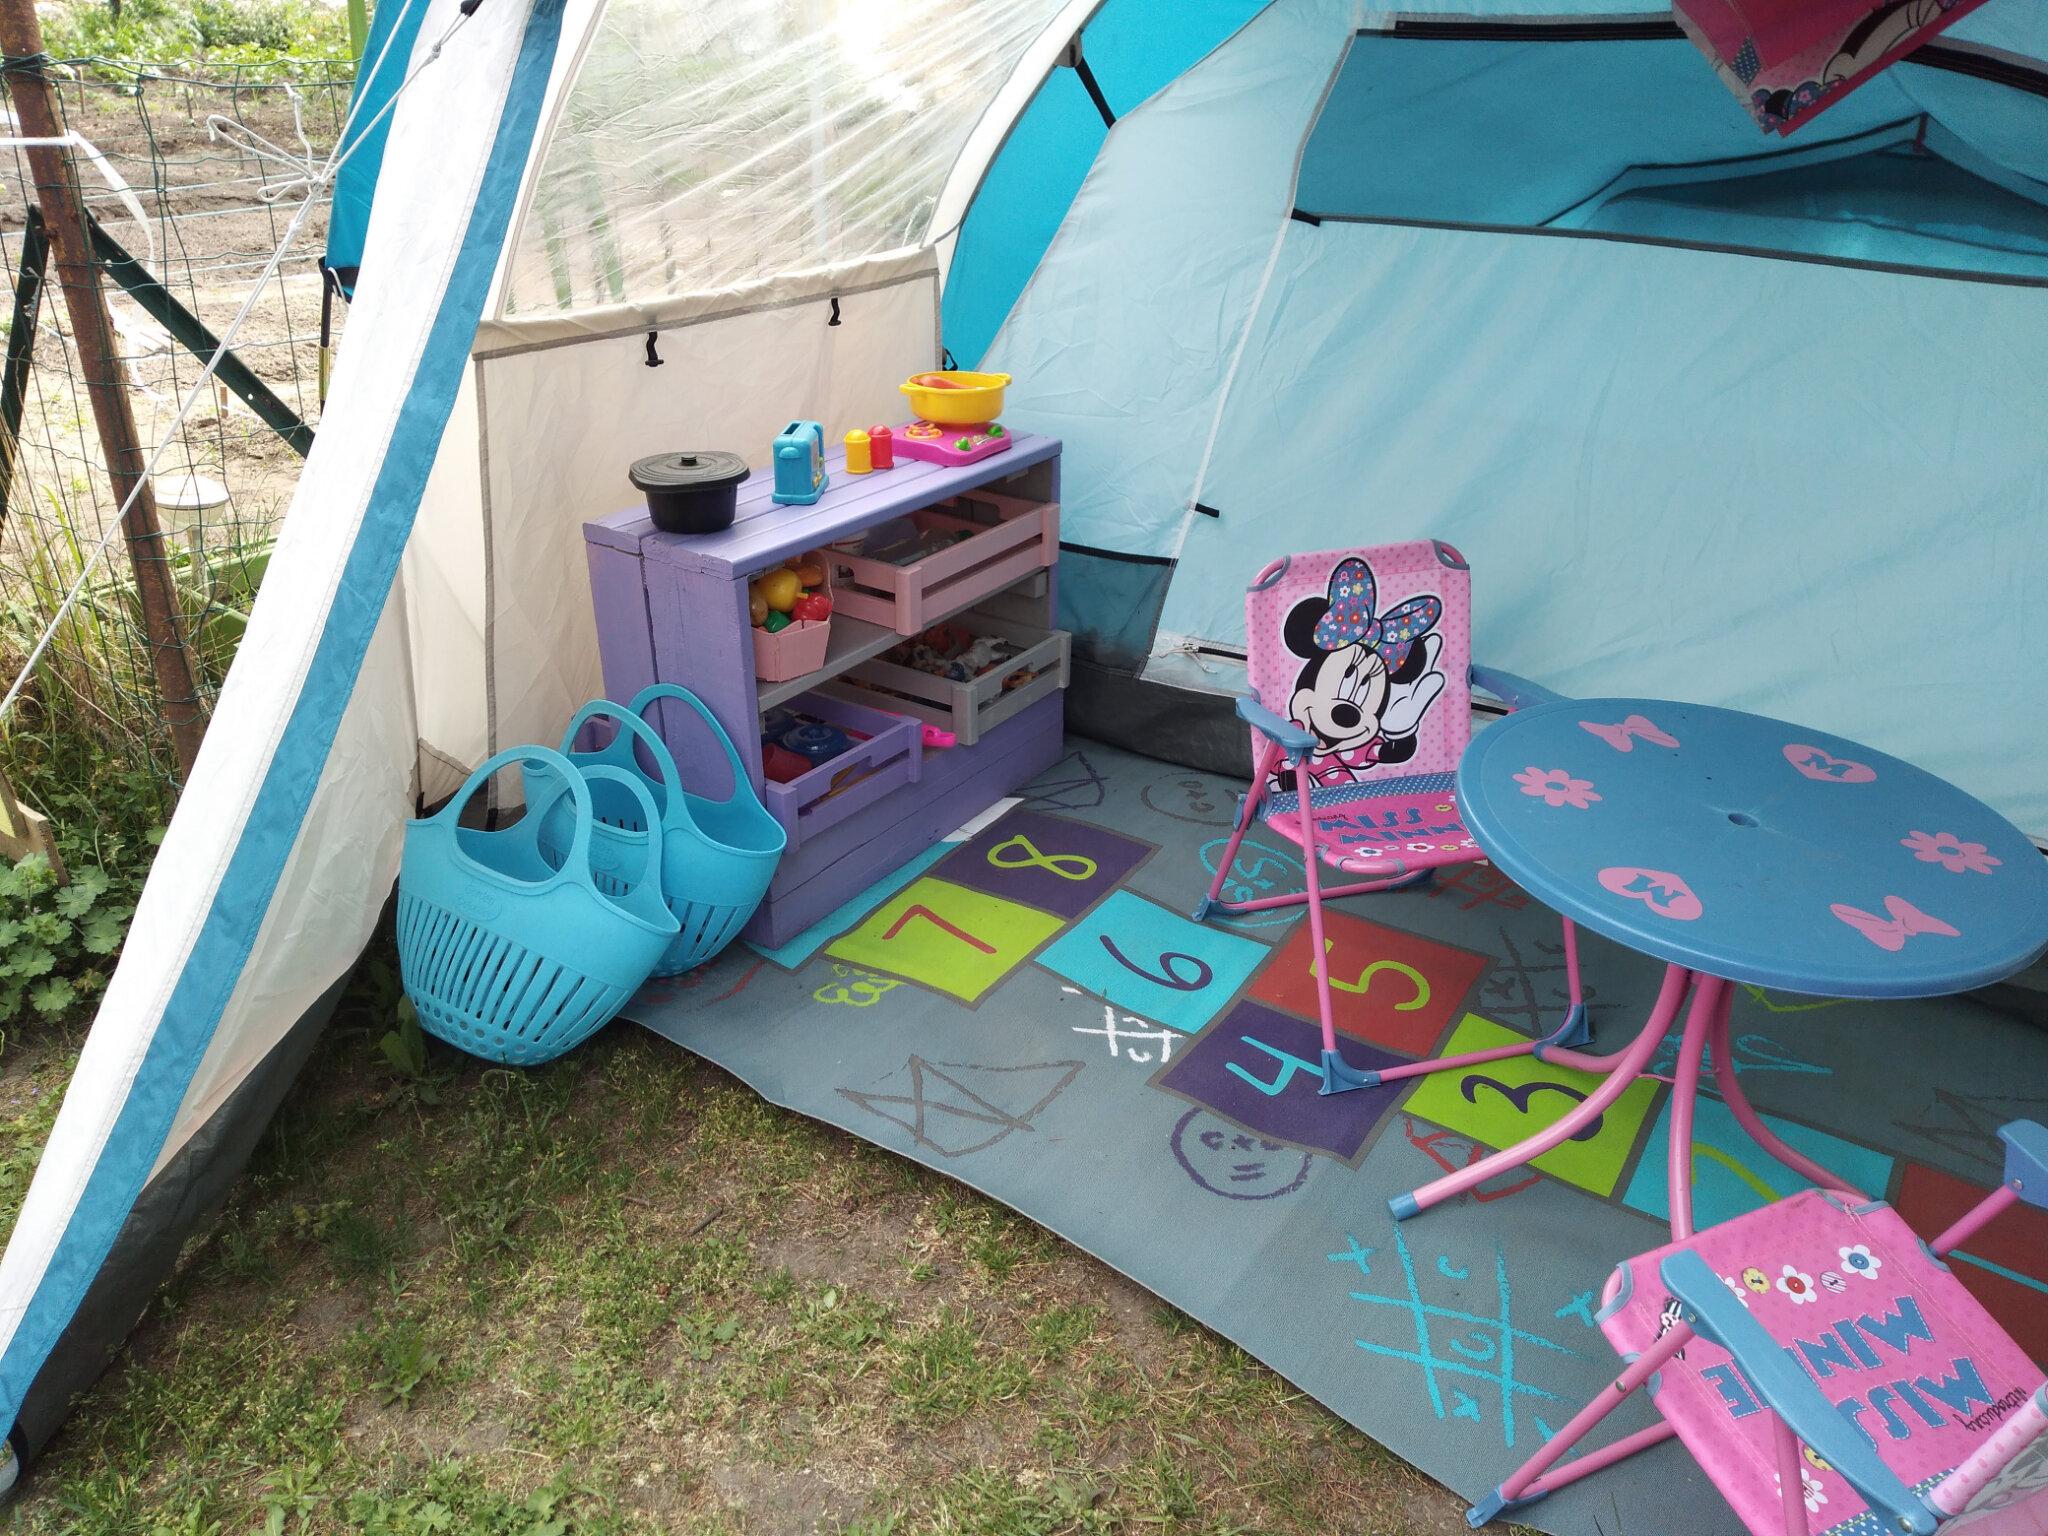 petite cuisine dans la tente1